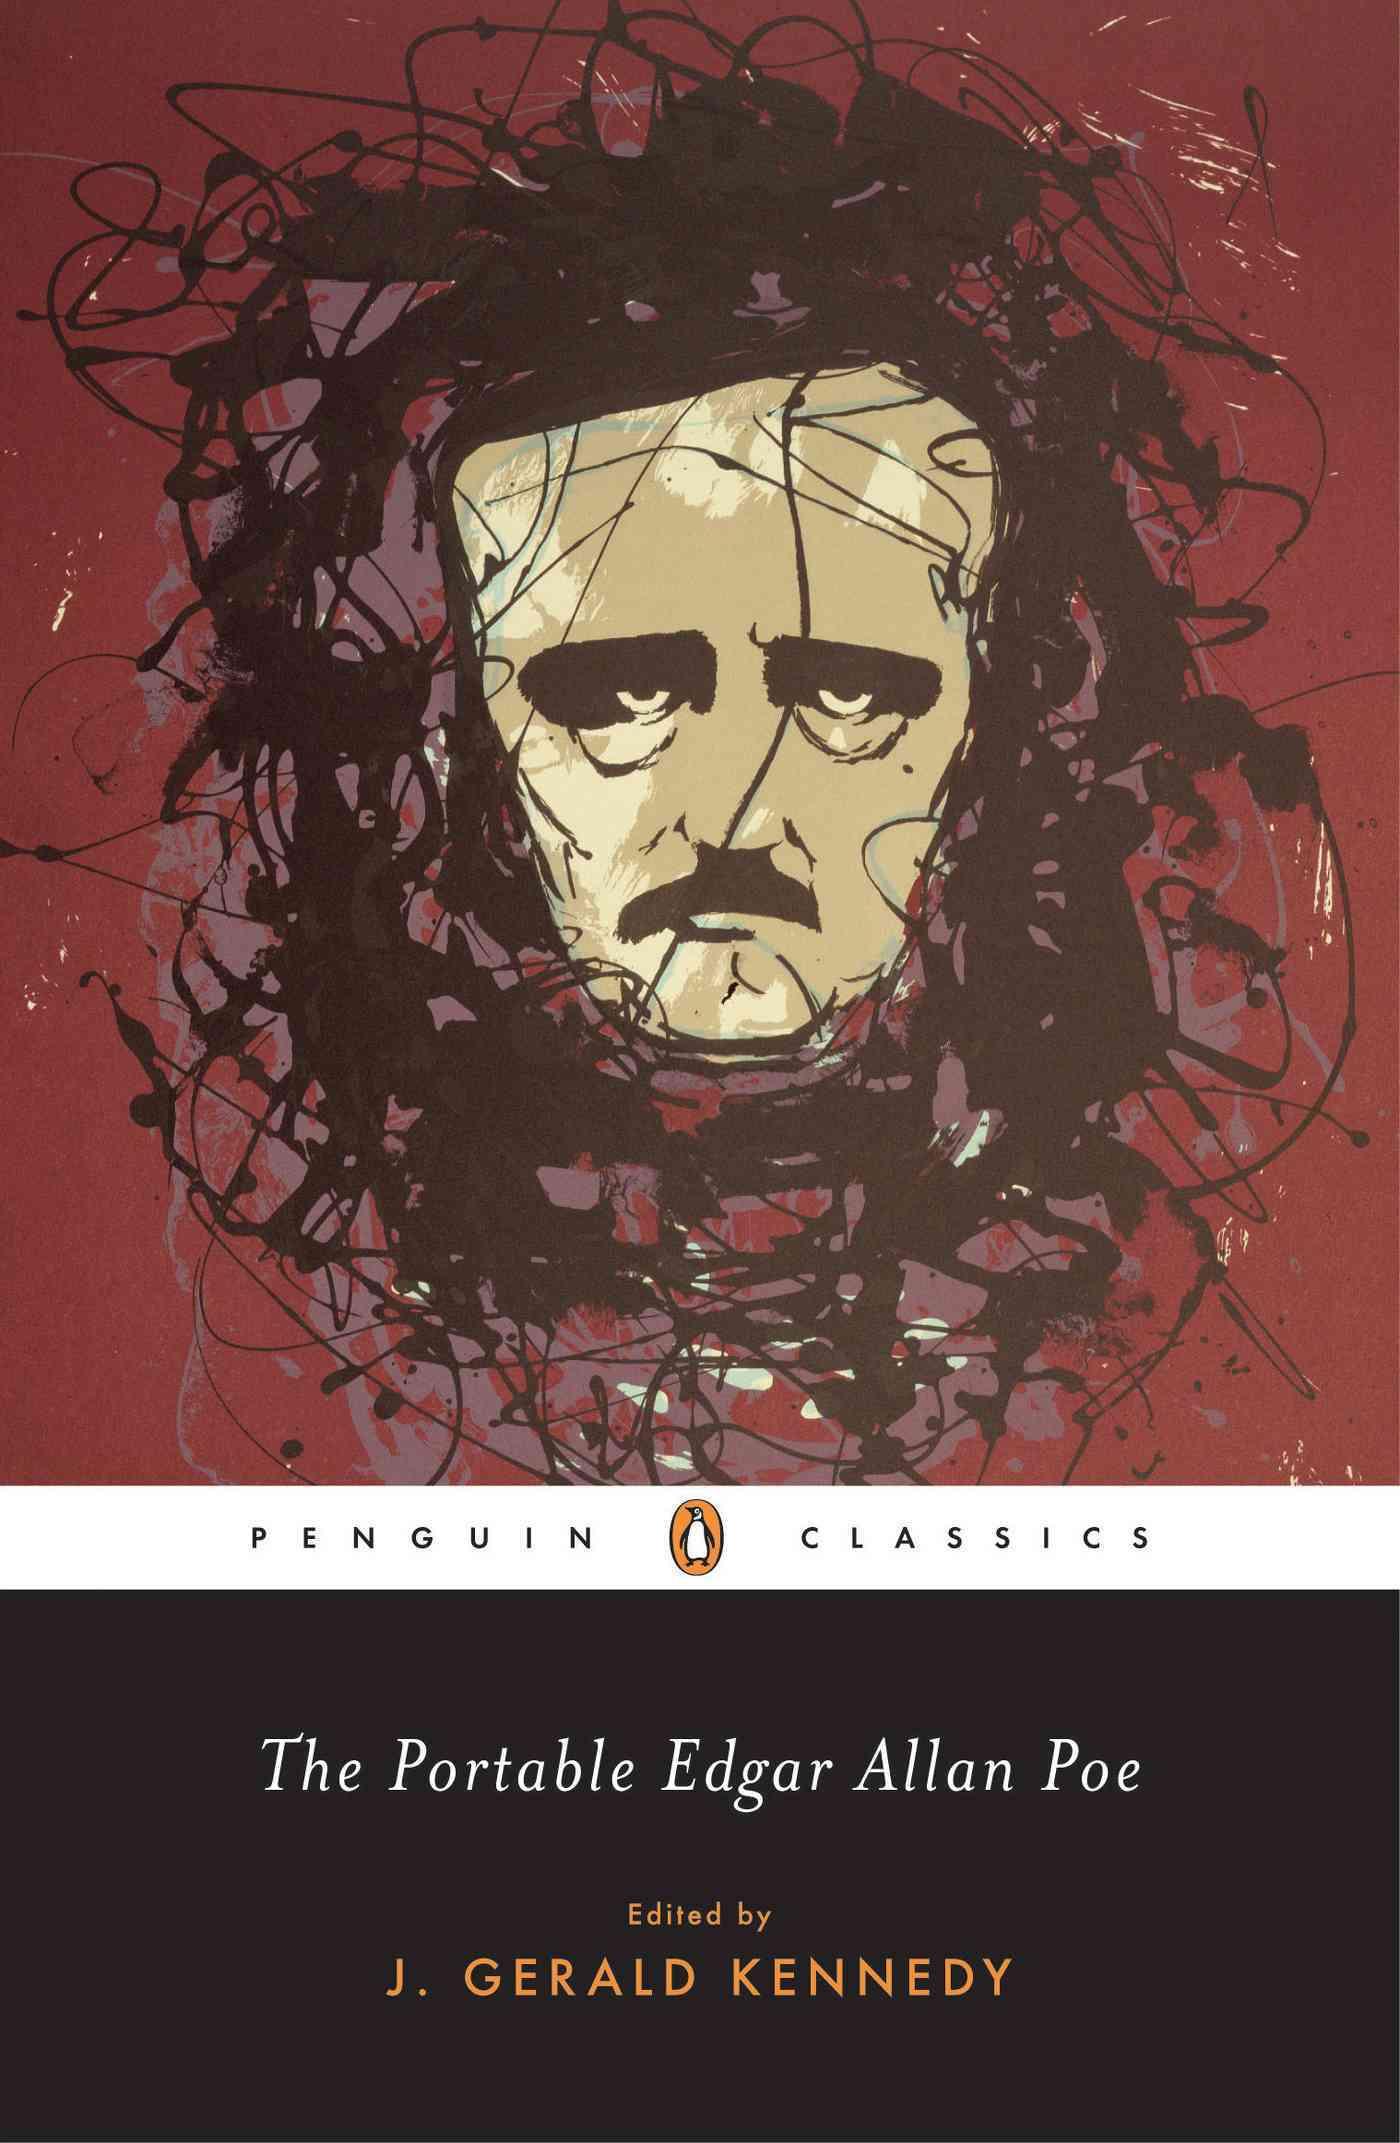 The Portable Edgar Allan Poe By Poe, Edgar Allan/ Kennedy, J. Gerald (EDT)